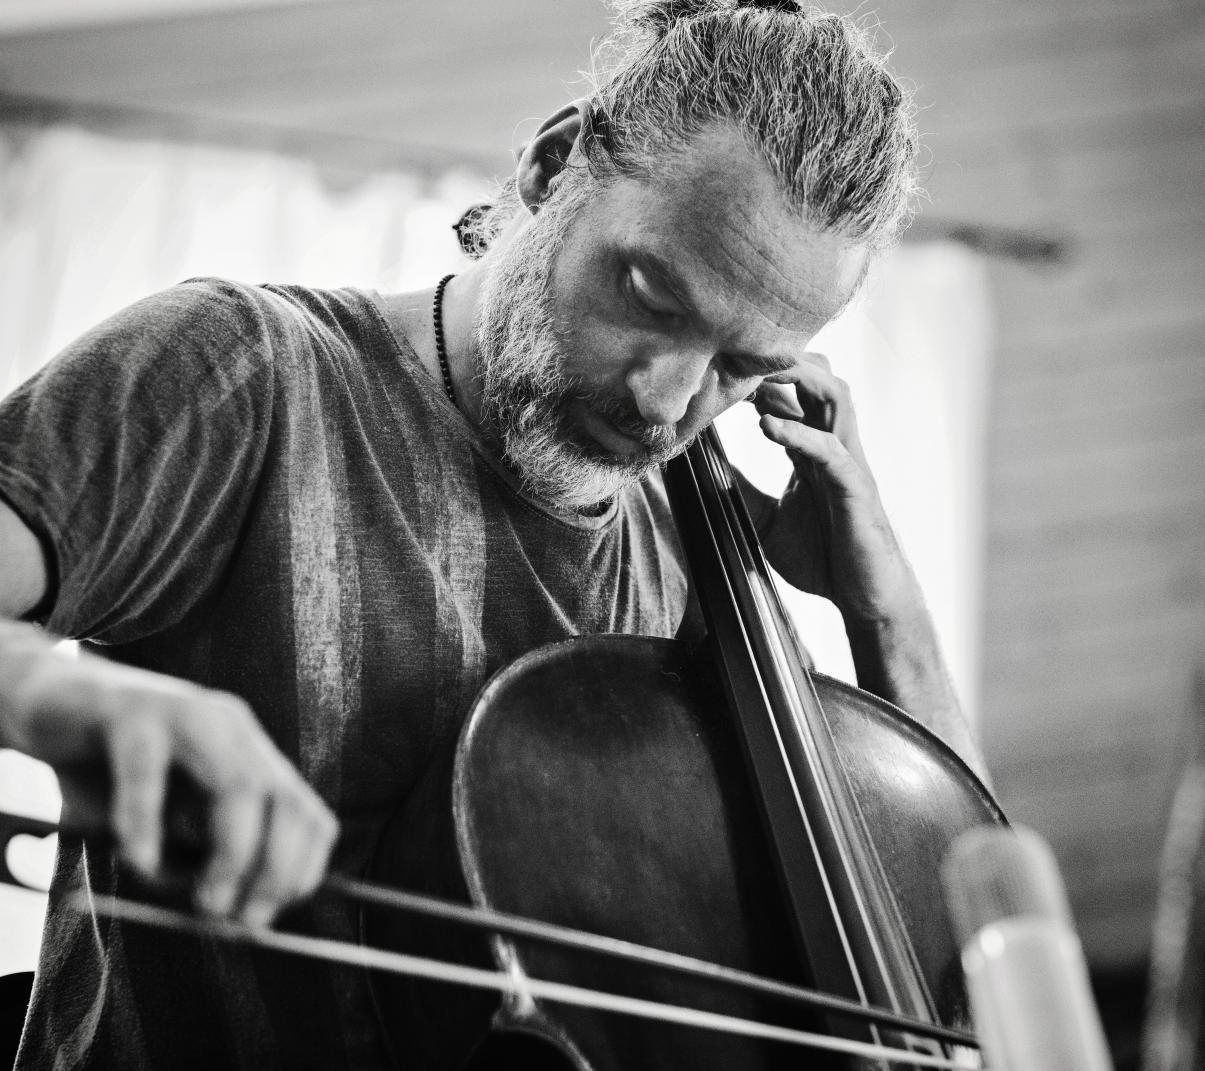 Jiří Bárta (foto Zuzana Böhnisch, 2018)